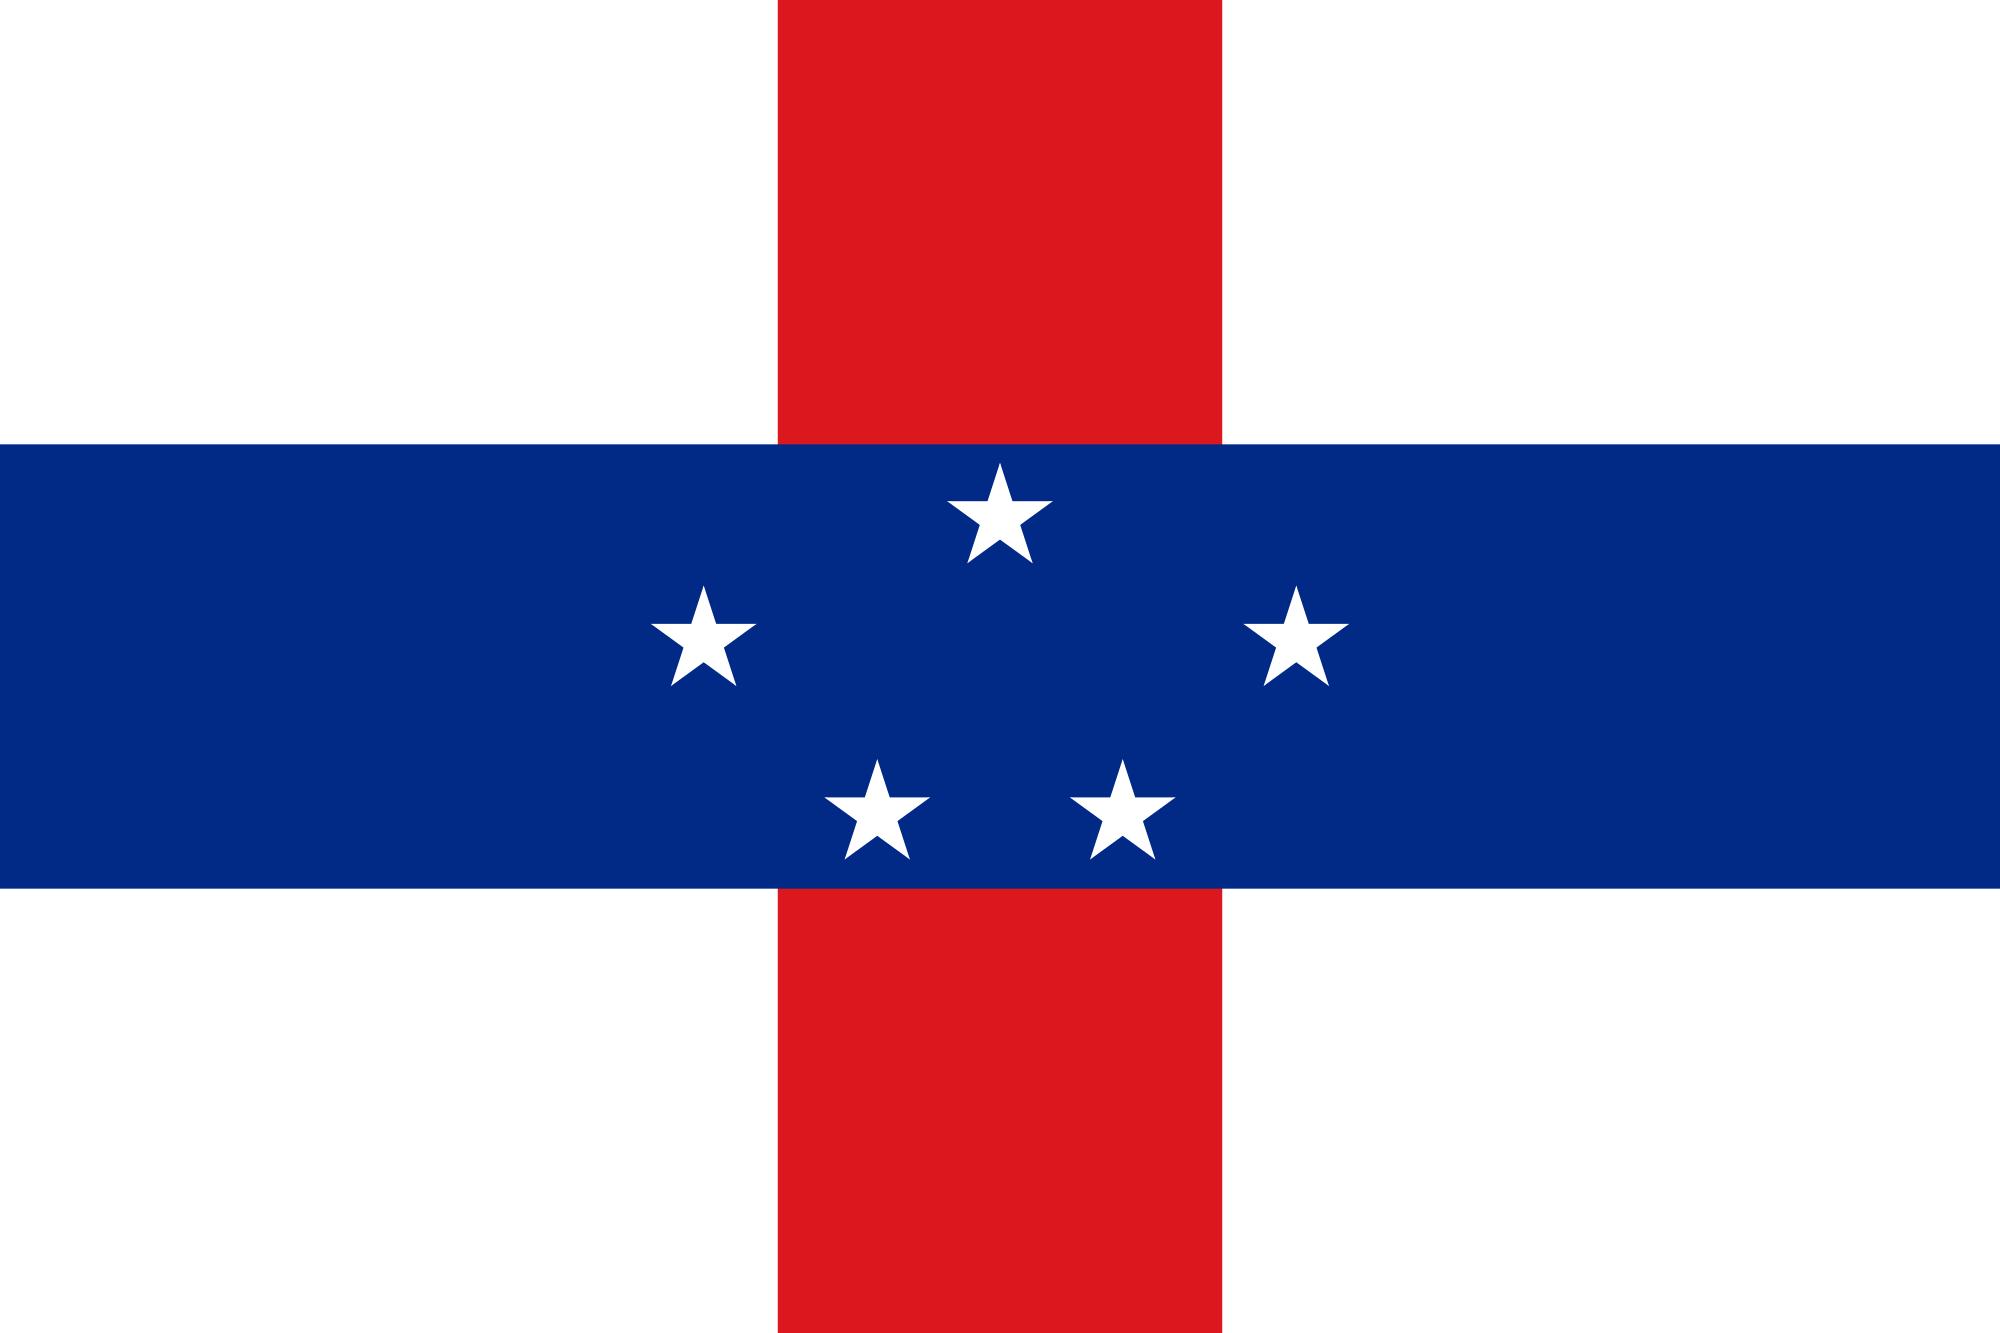 antillas holandesas, país, emblema, insignia, シンボル - HD の壁紙 - 教授-falken.com